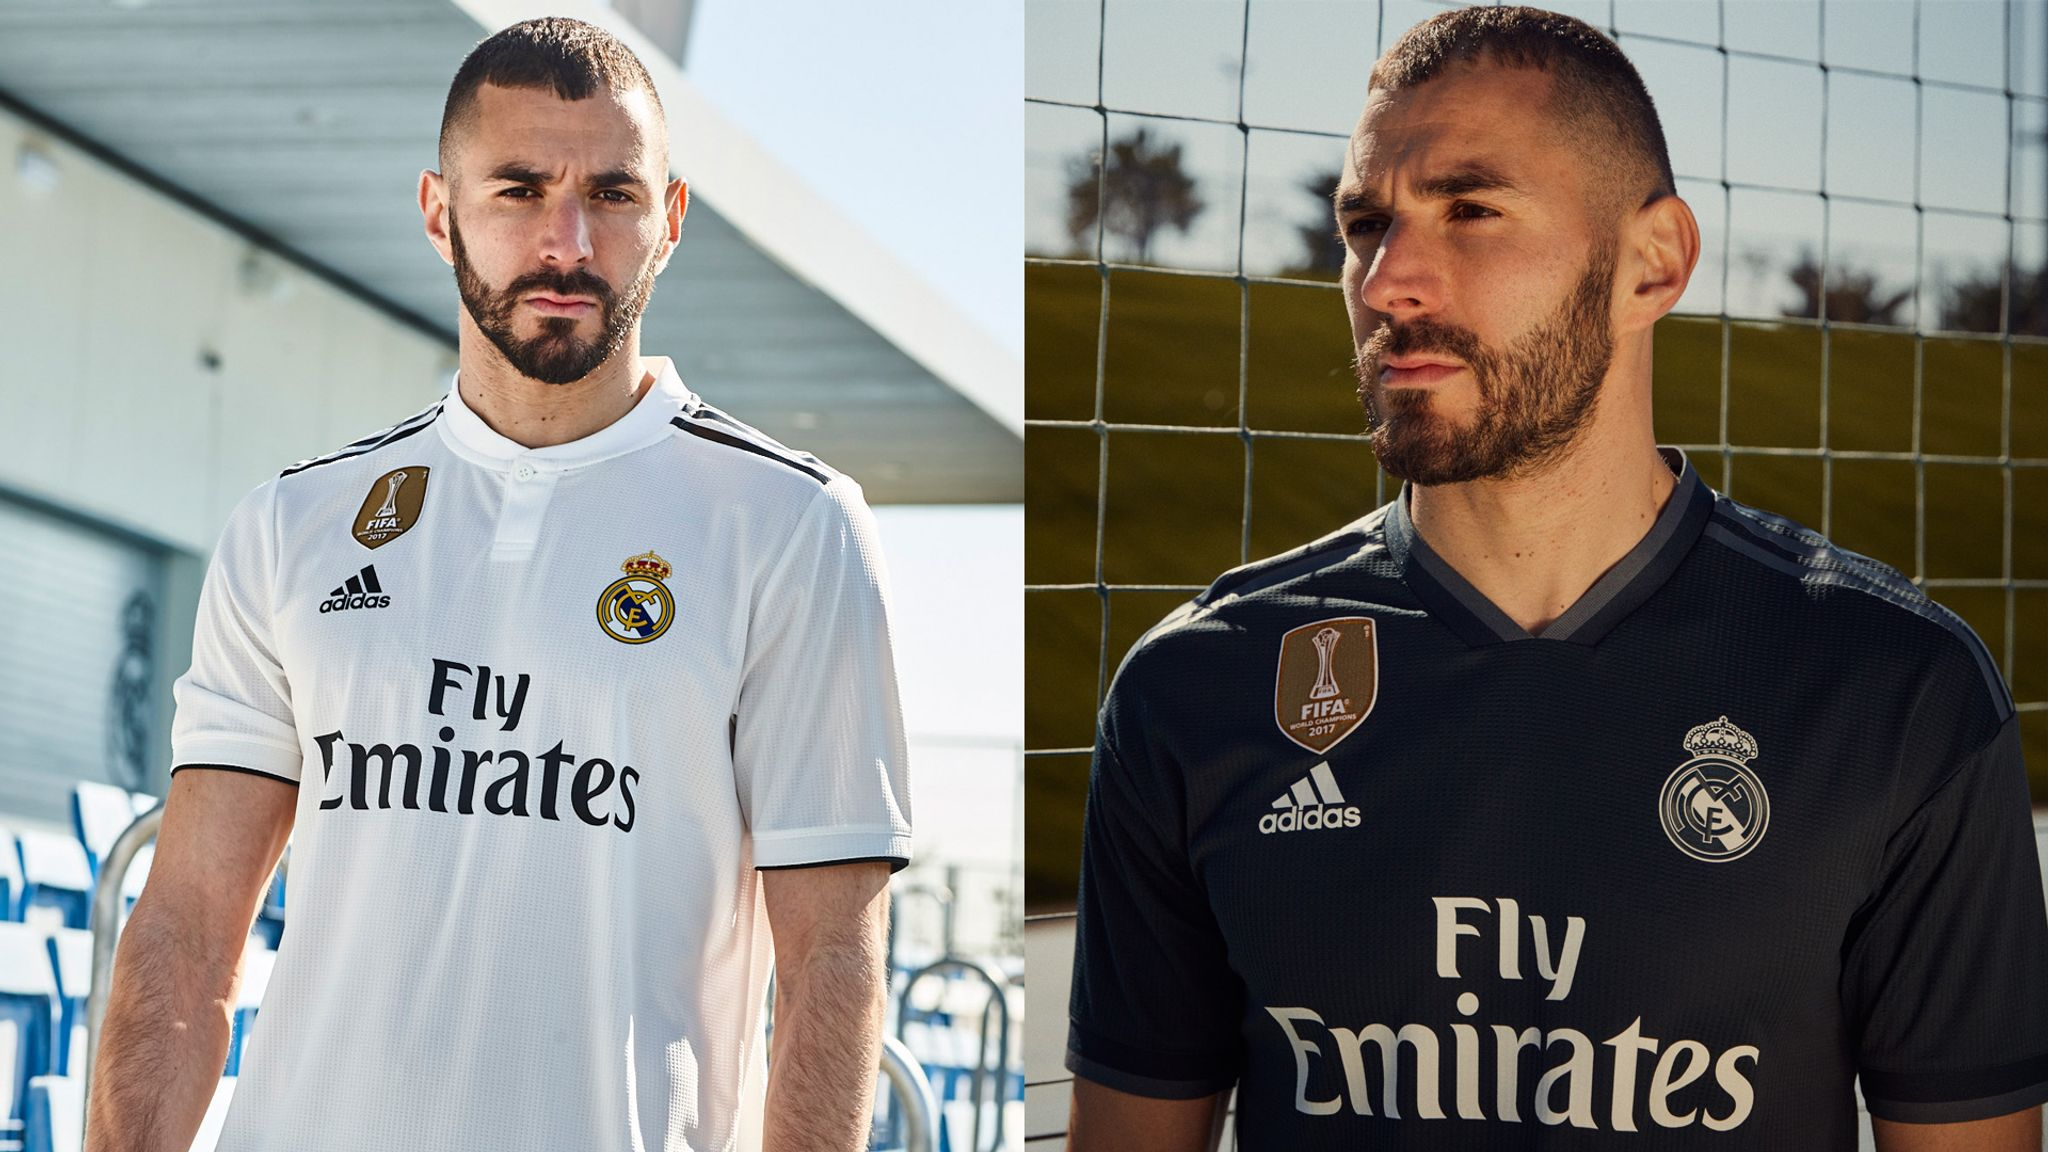 ea6bbe7a5b7 New football kits: European strips for the 2018/19 season   Football News    Sky Sports